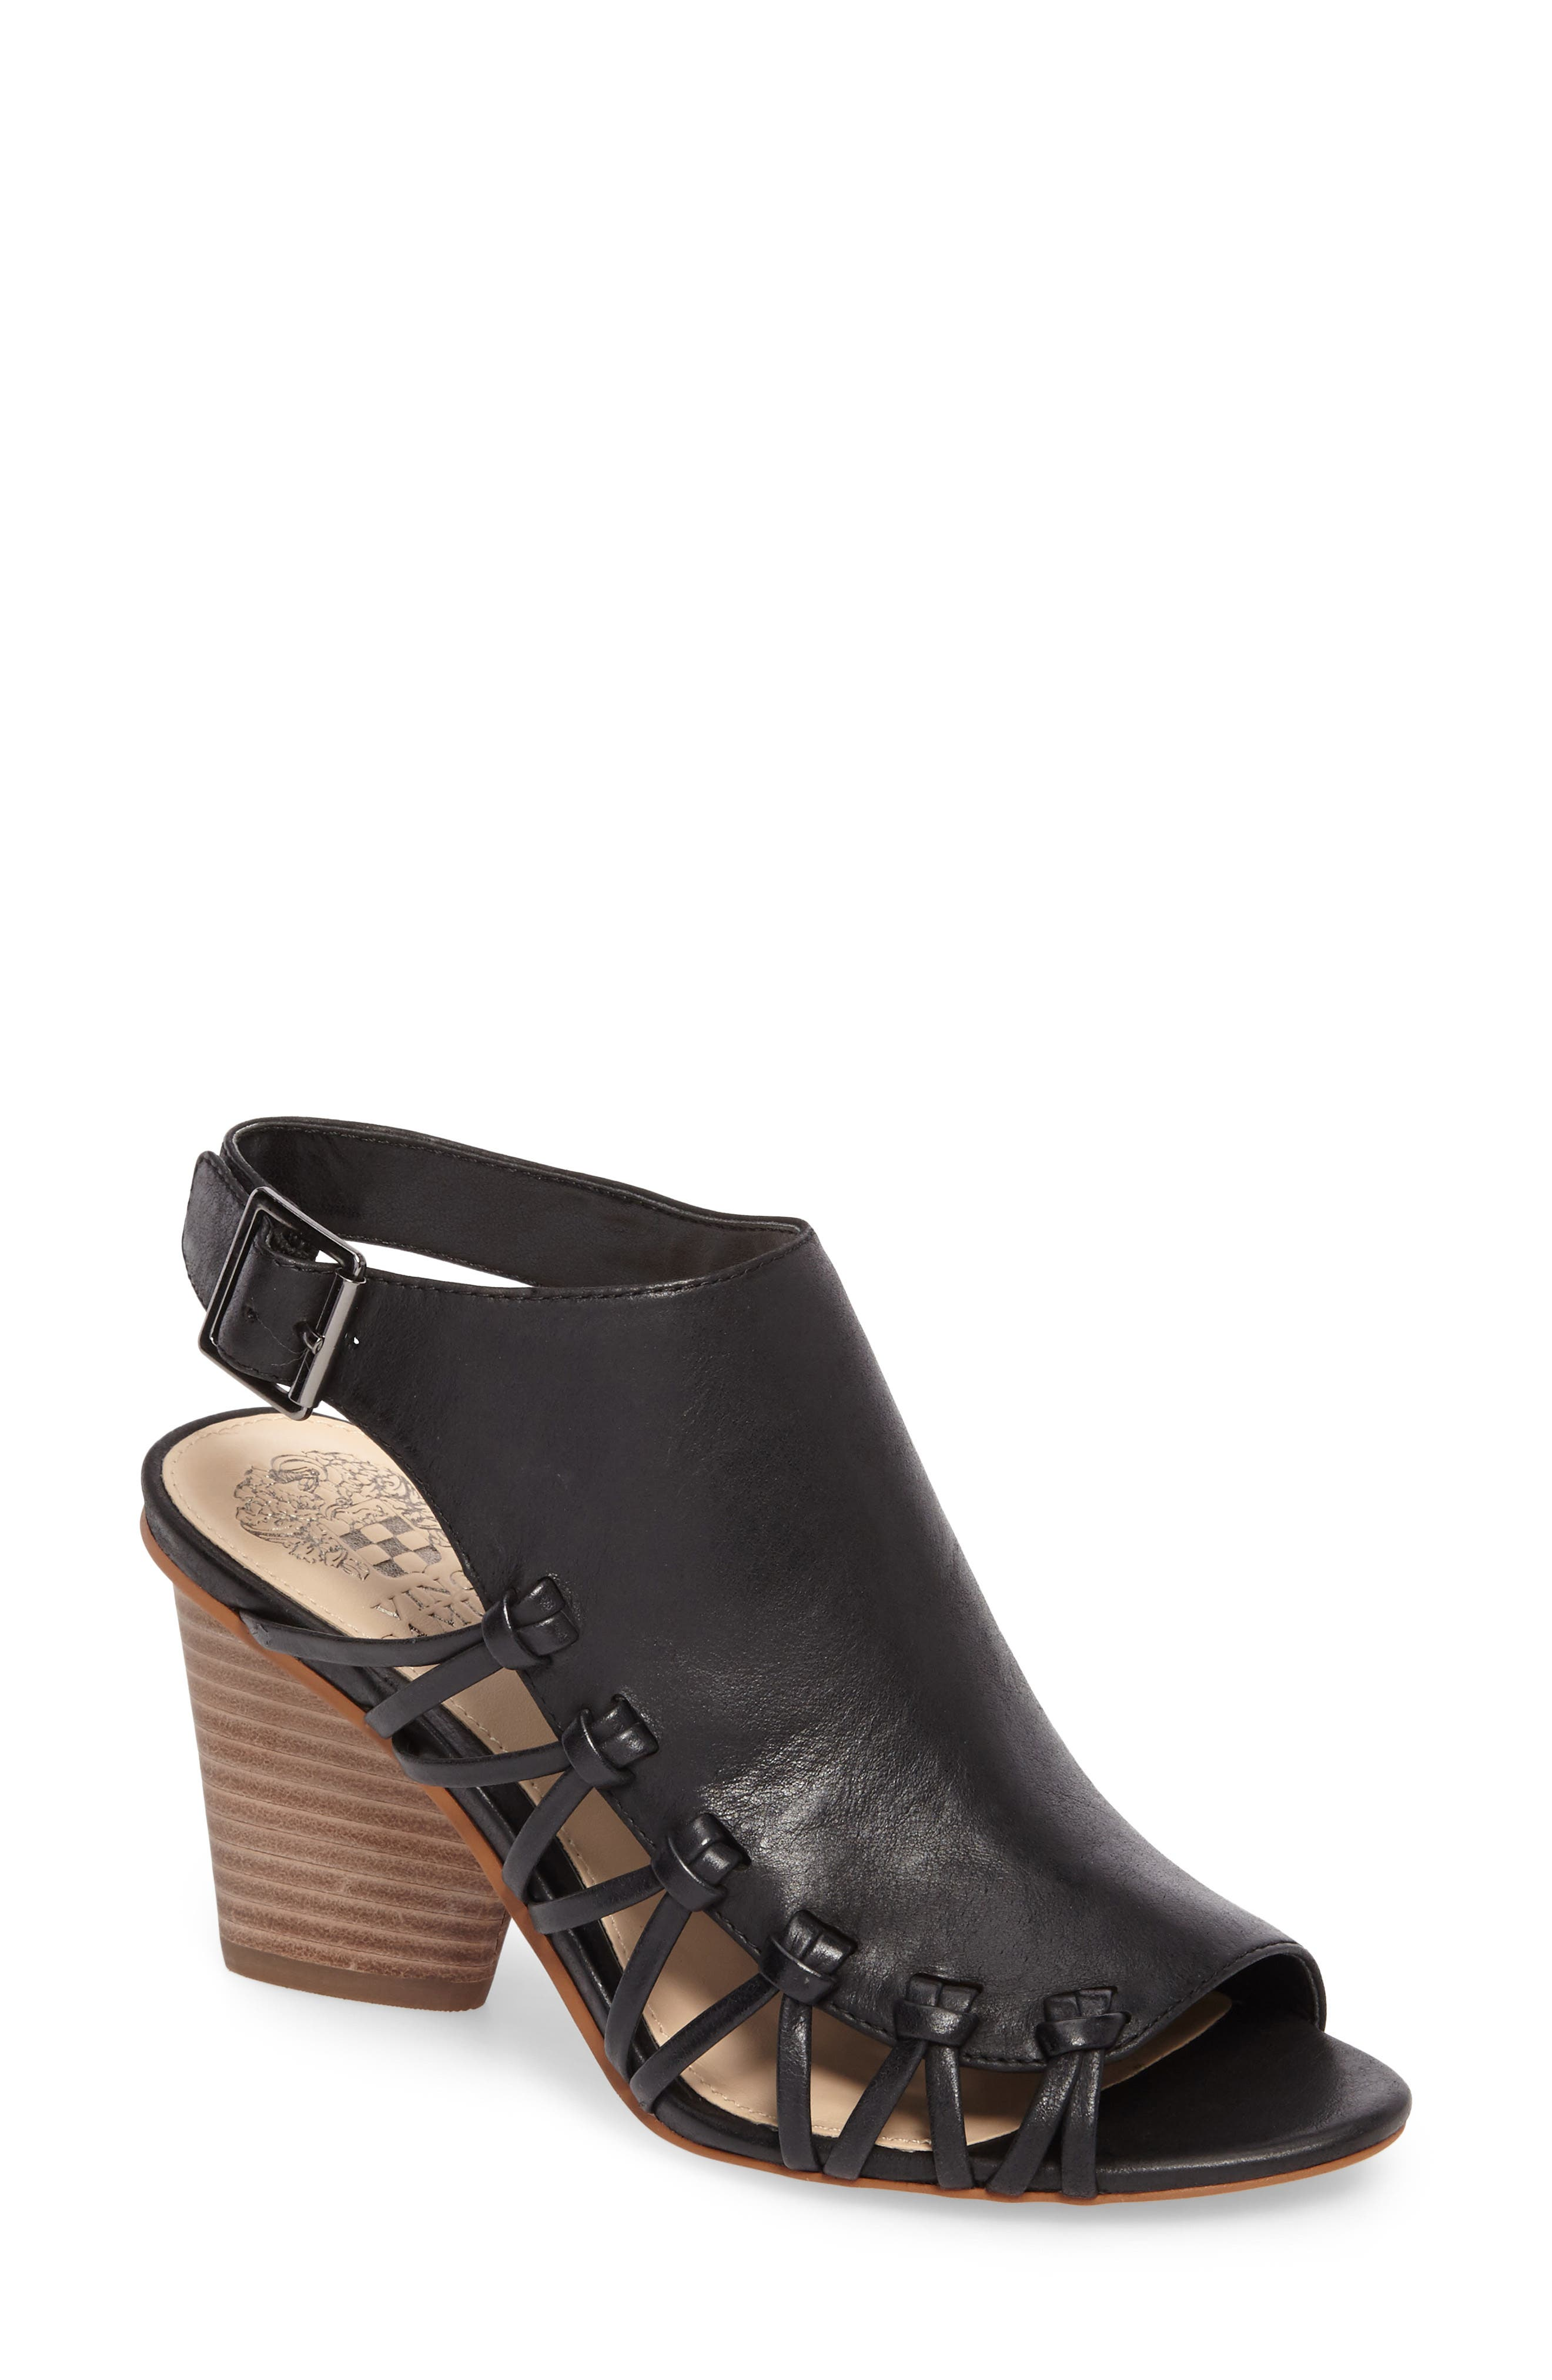 Ankara Sandal,                             Main thumbnail 1, color,                             Black Leather